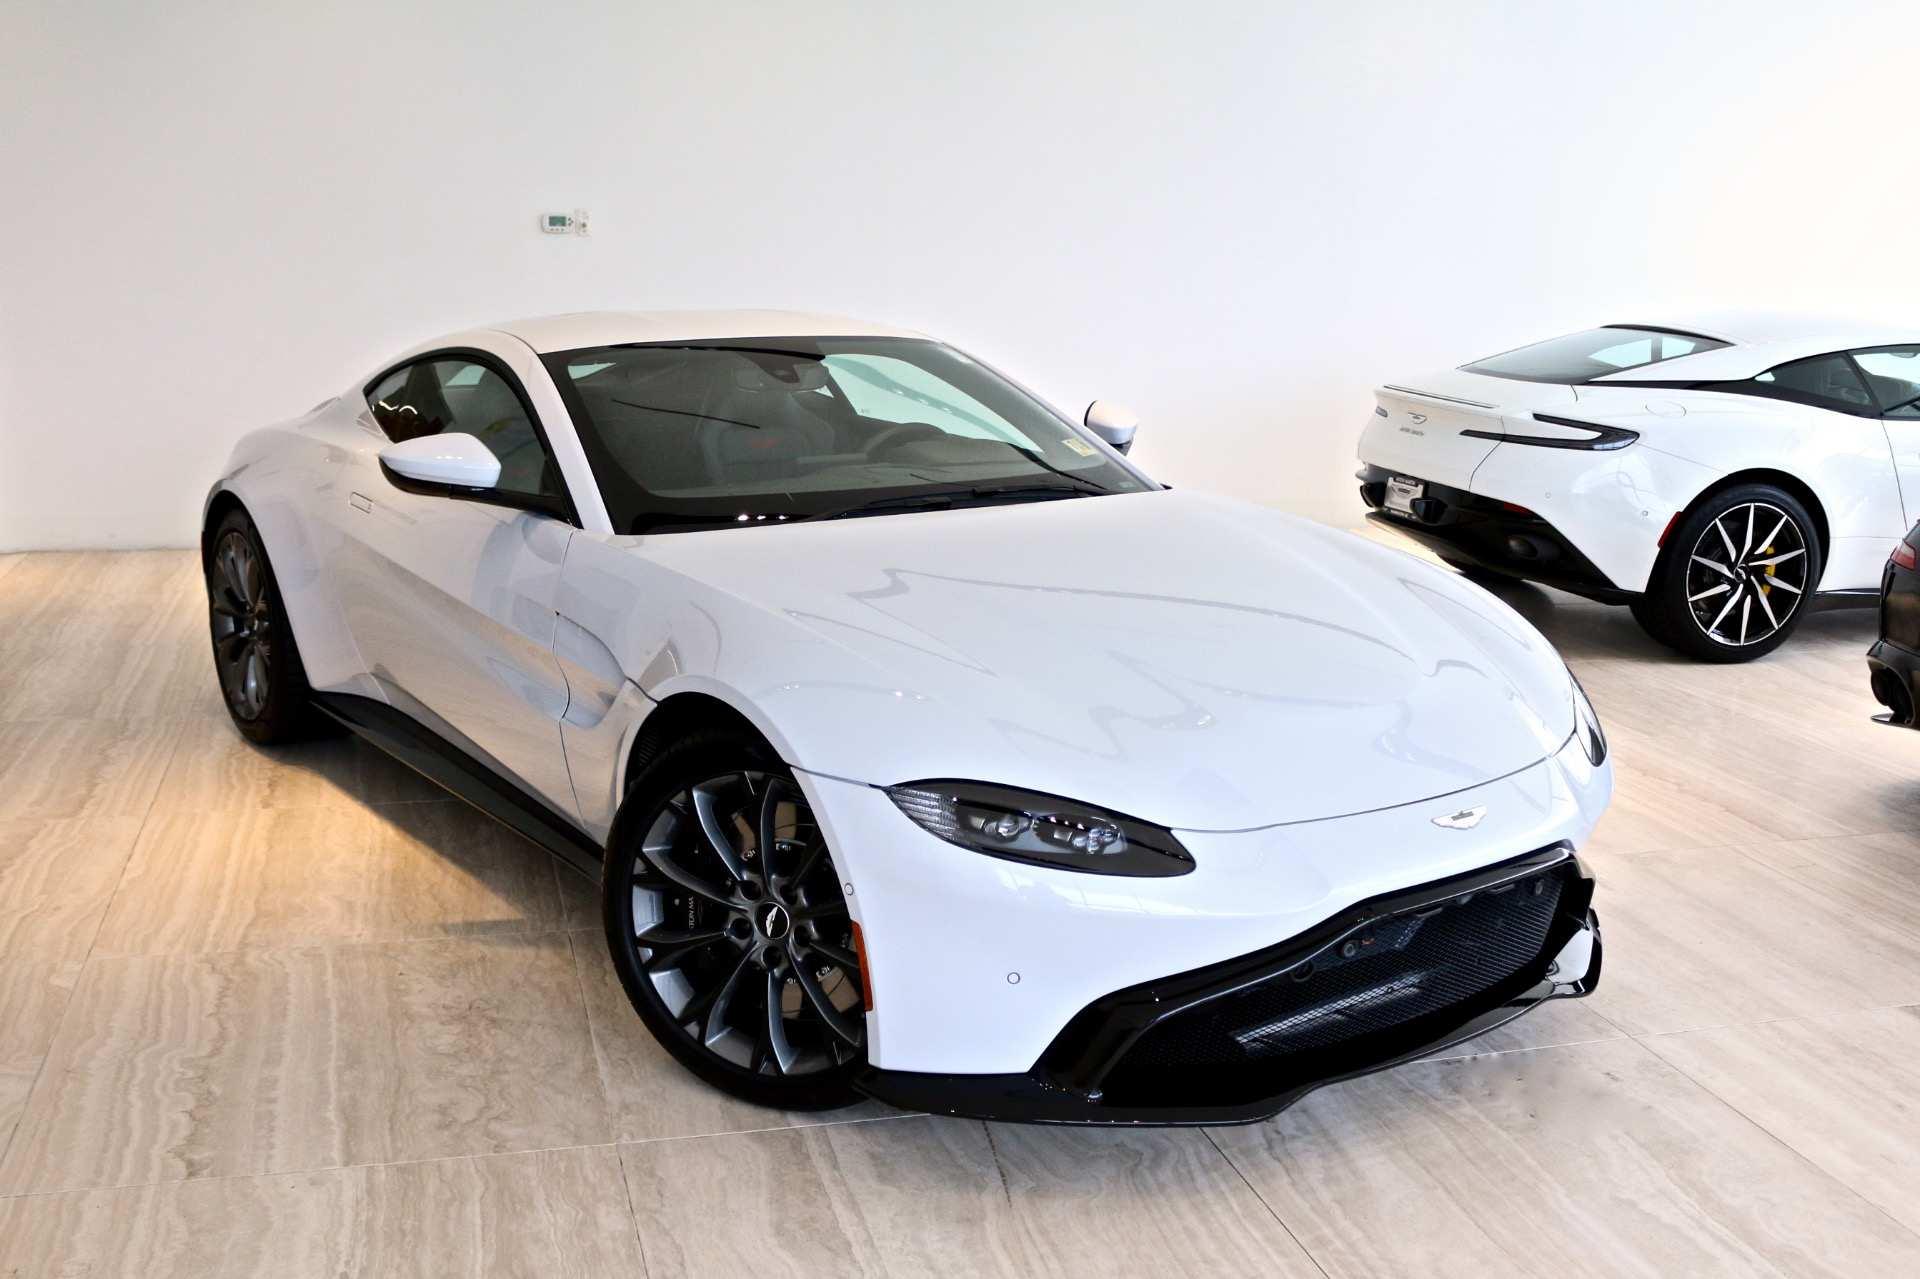 20 New 2019 Aston Martin Vantage History by 2019 Aston Martin Vantage